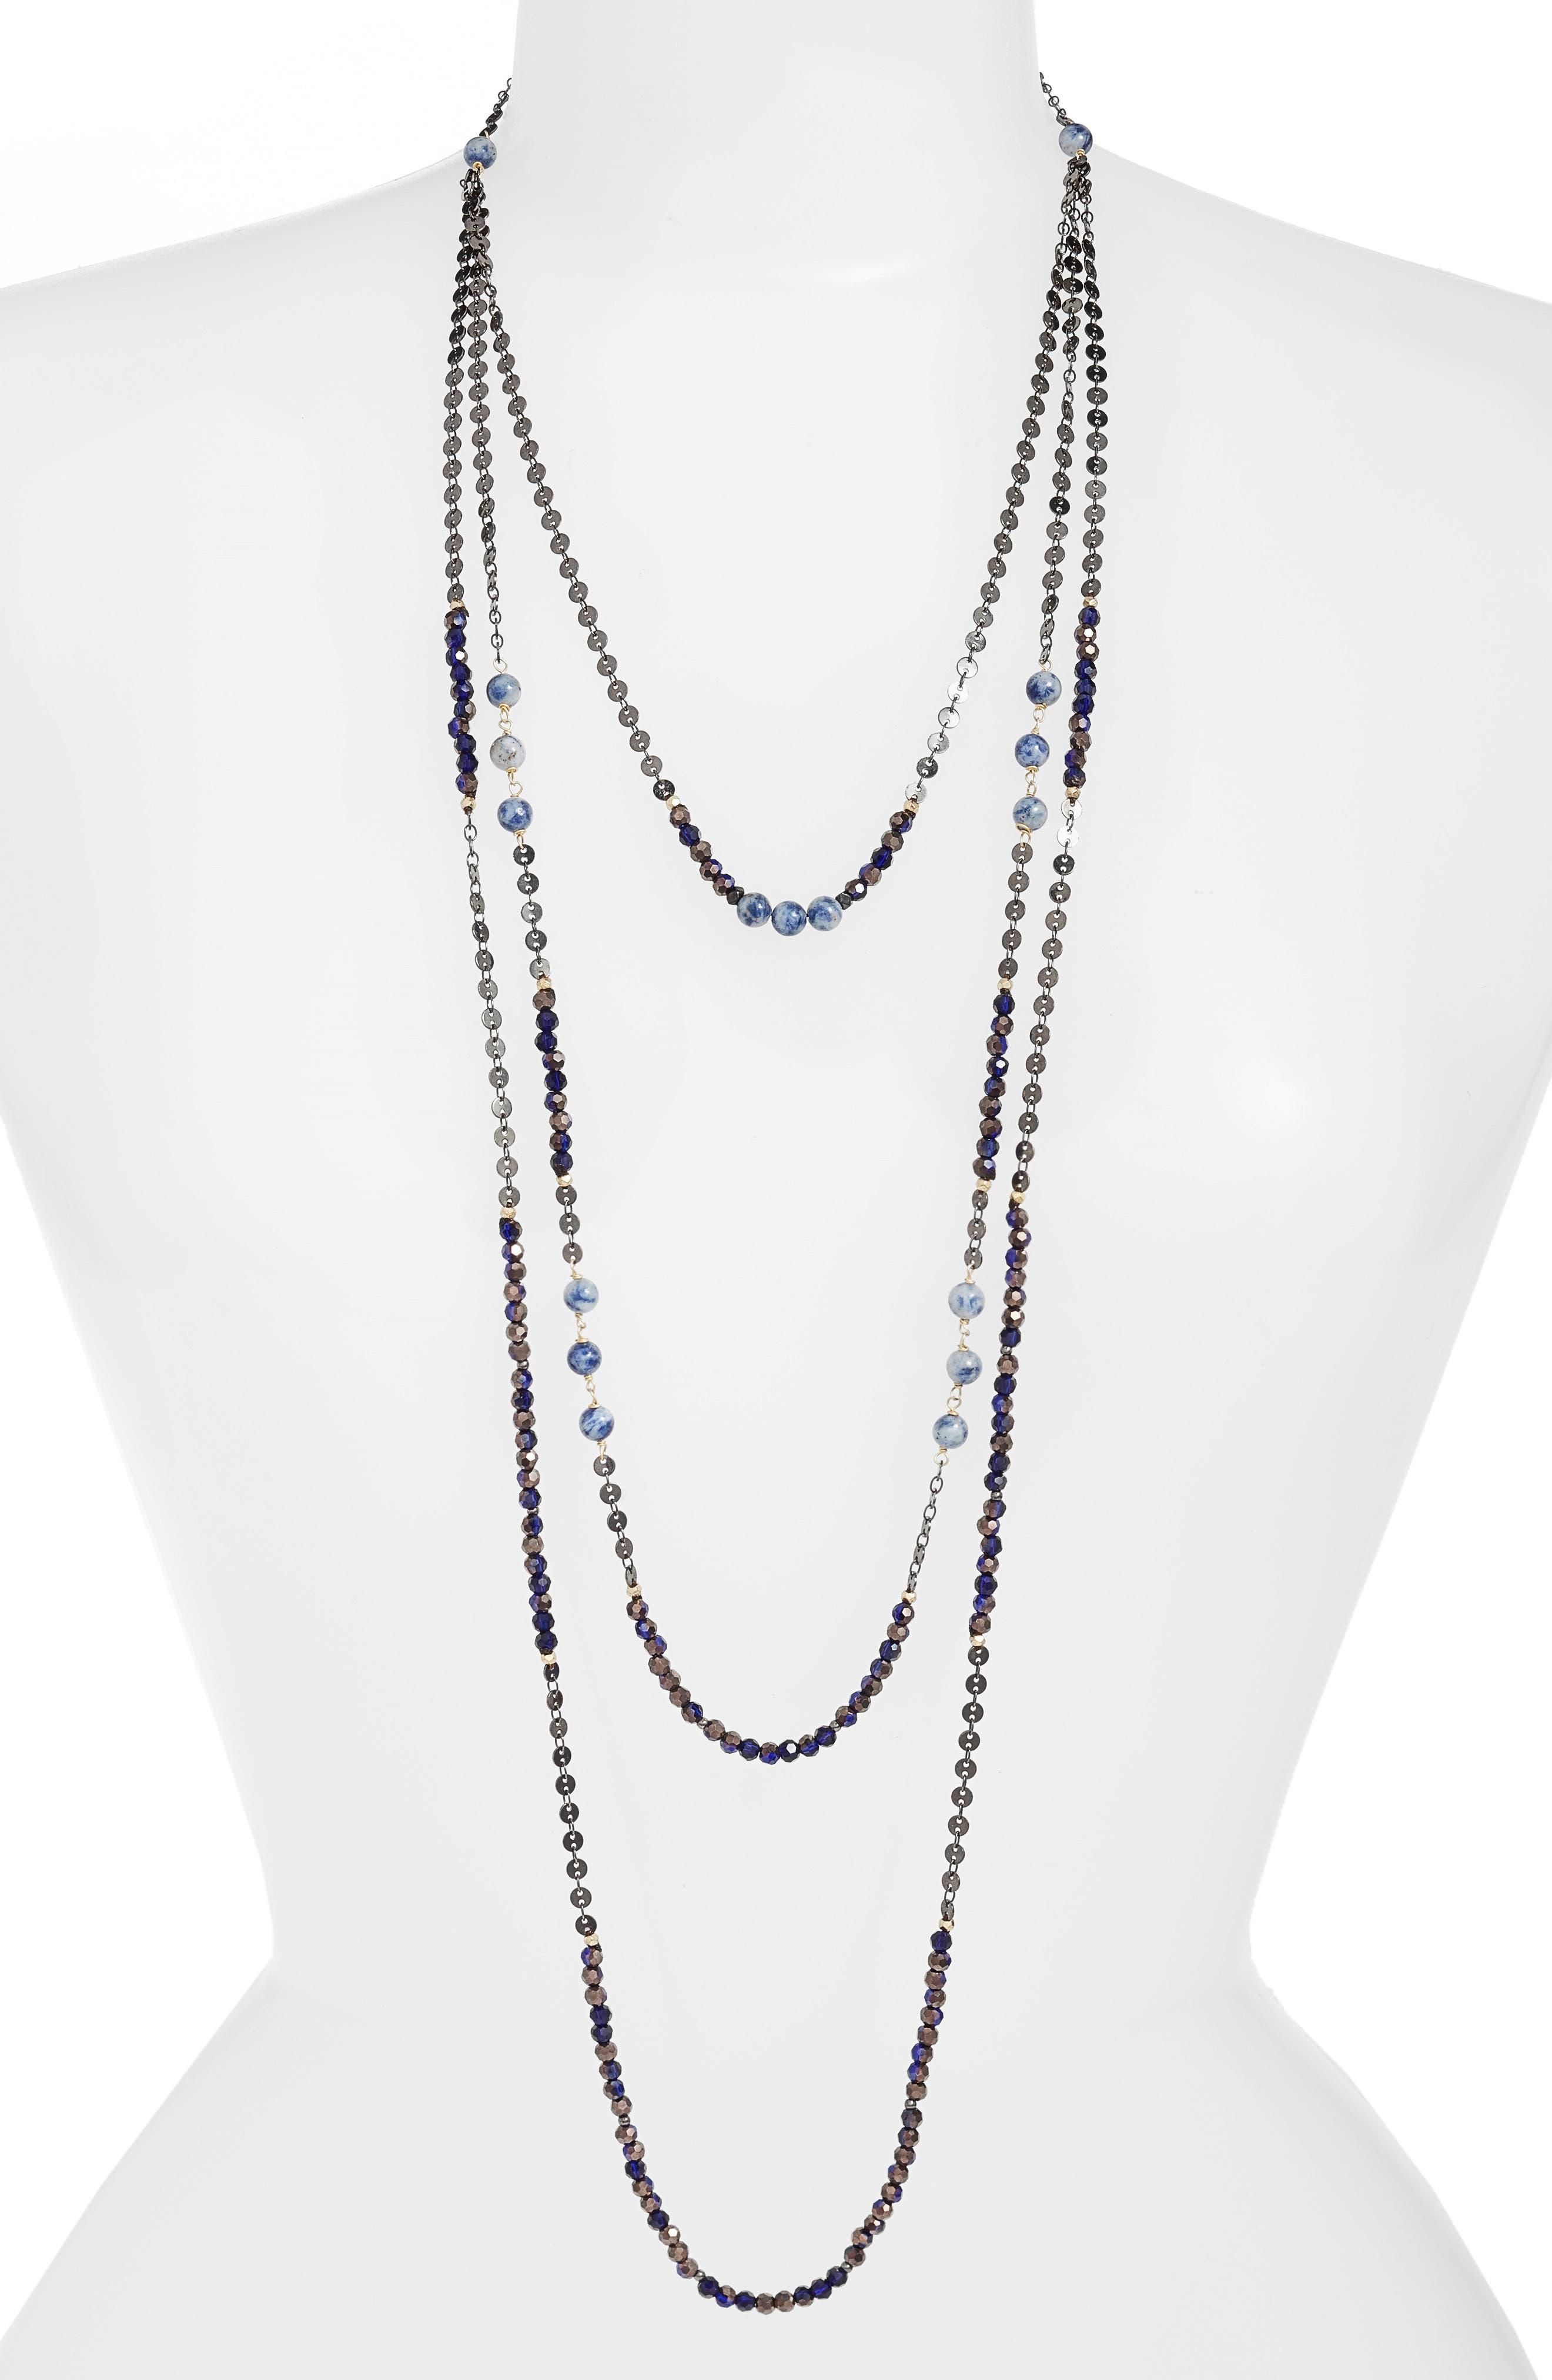 Main Image - Nakamol Semiprecious Stone Triple Strand Necklace